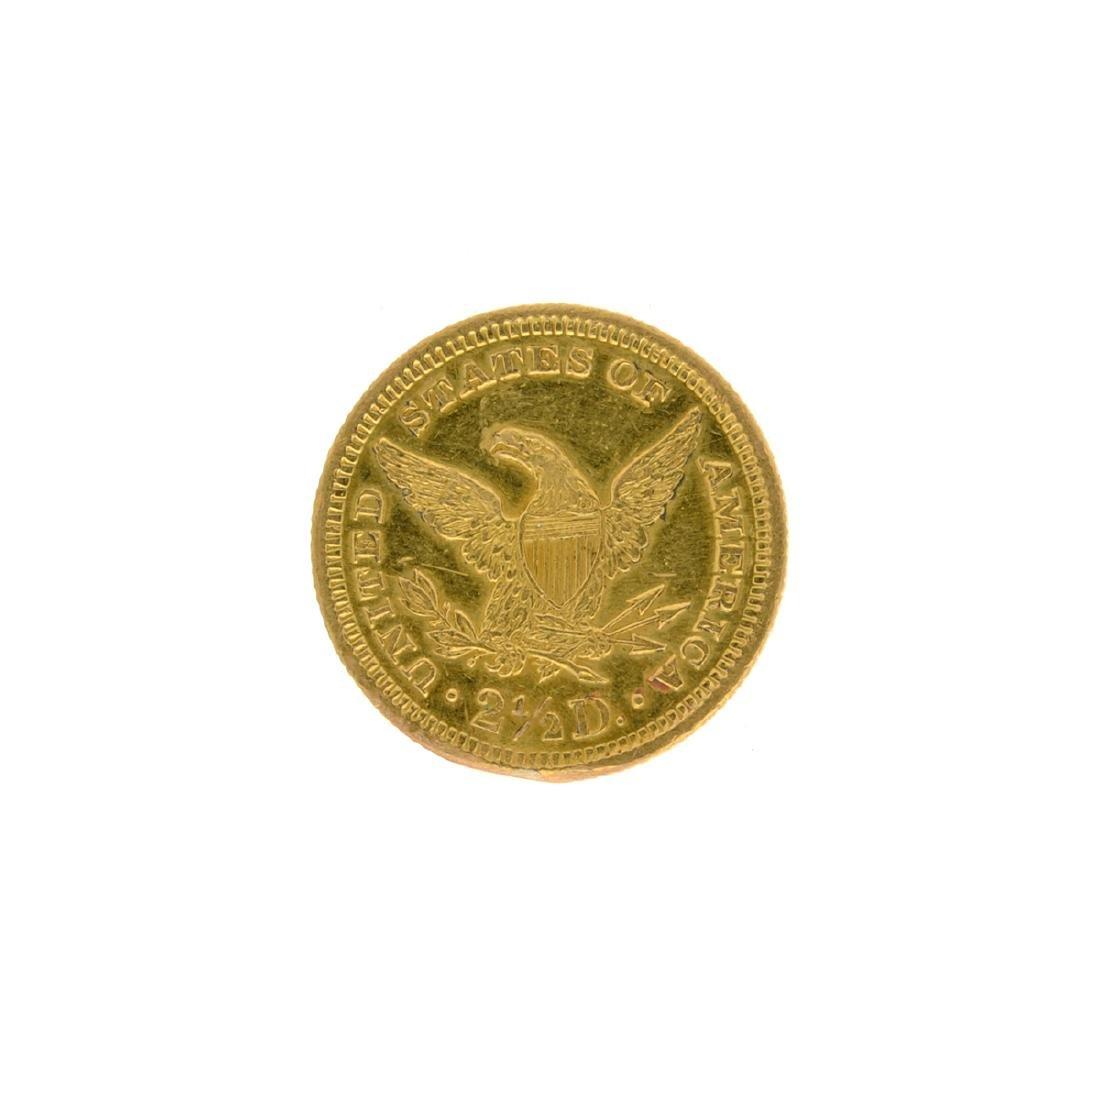 1905 $2.50 U.S. Liberty Head Gold Coin - 2